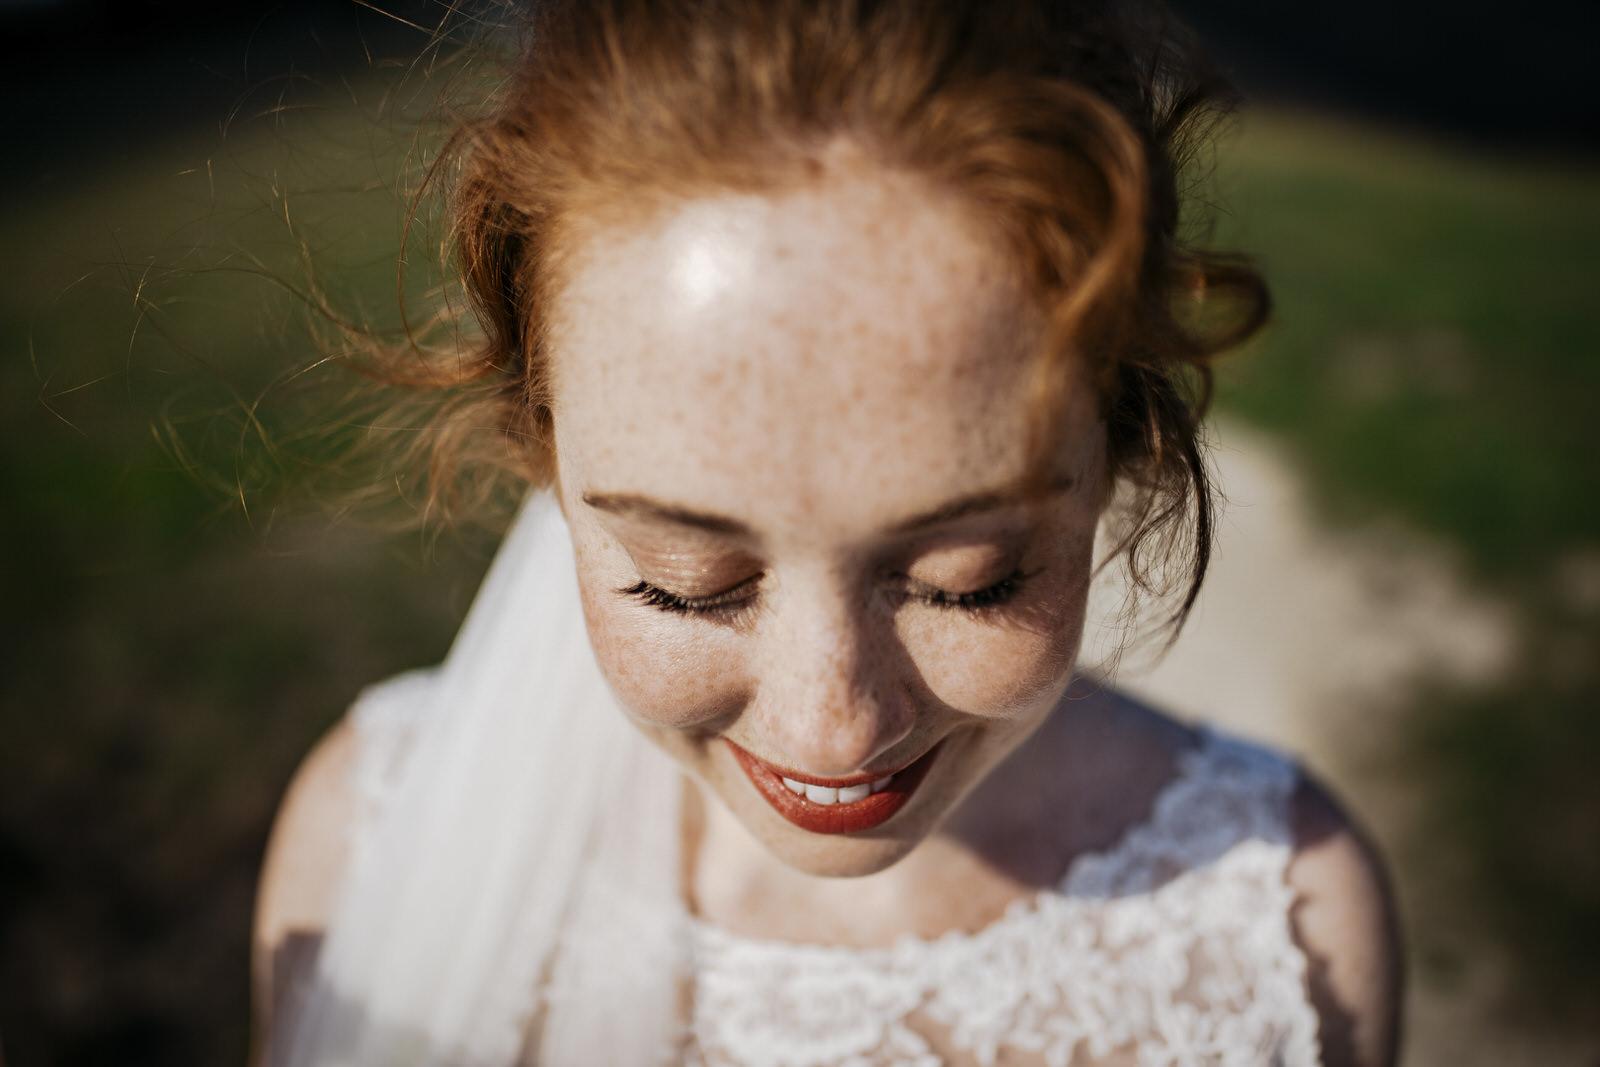 wedding photographer in italy-venice-tuscany-florence-amalfi coast-como lake-villa del balbianello-siena-amalfi-ravello-belmond-villa cimbrone53